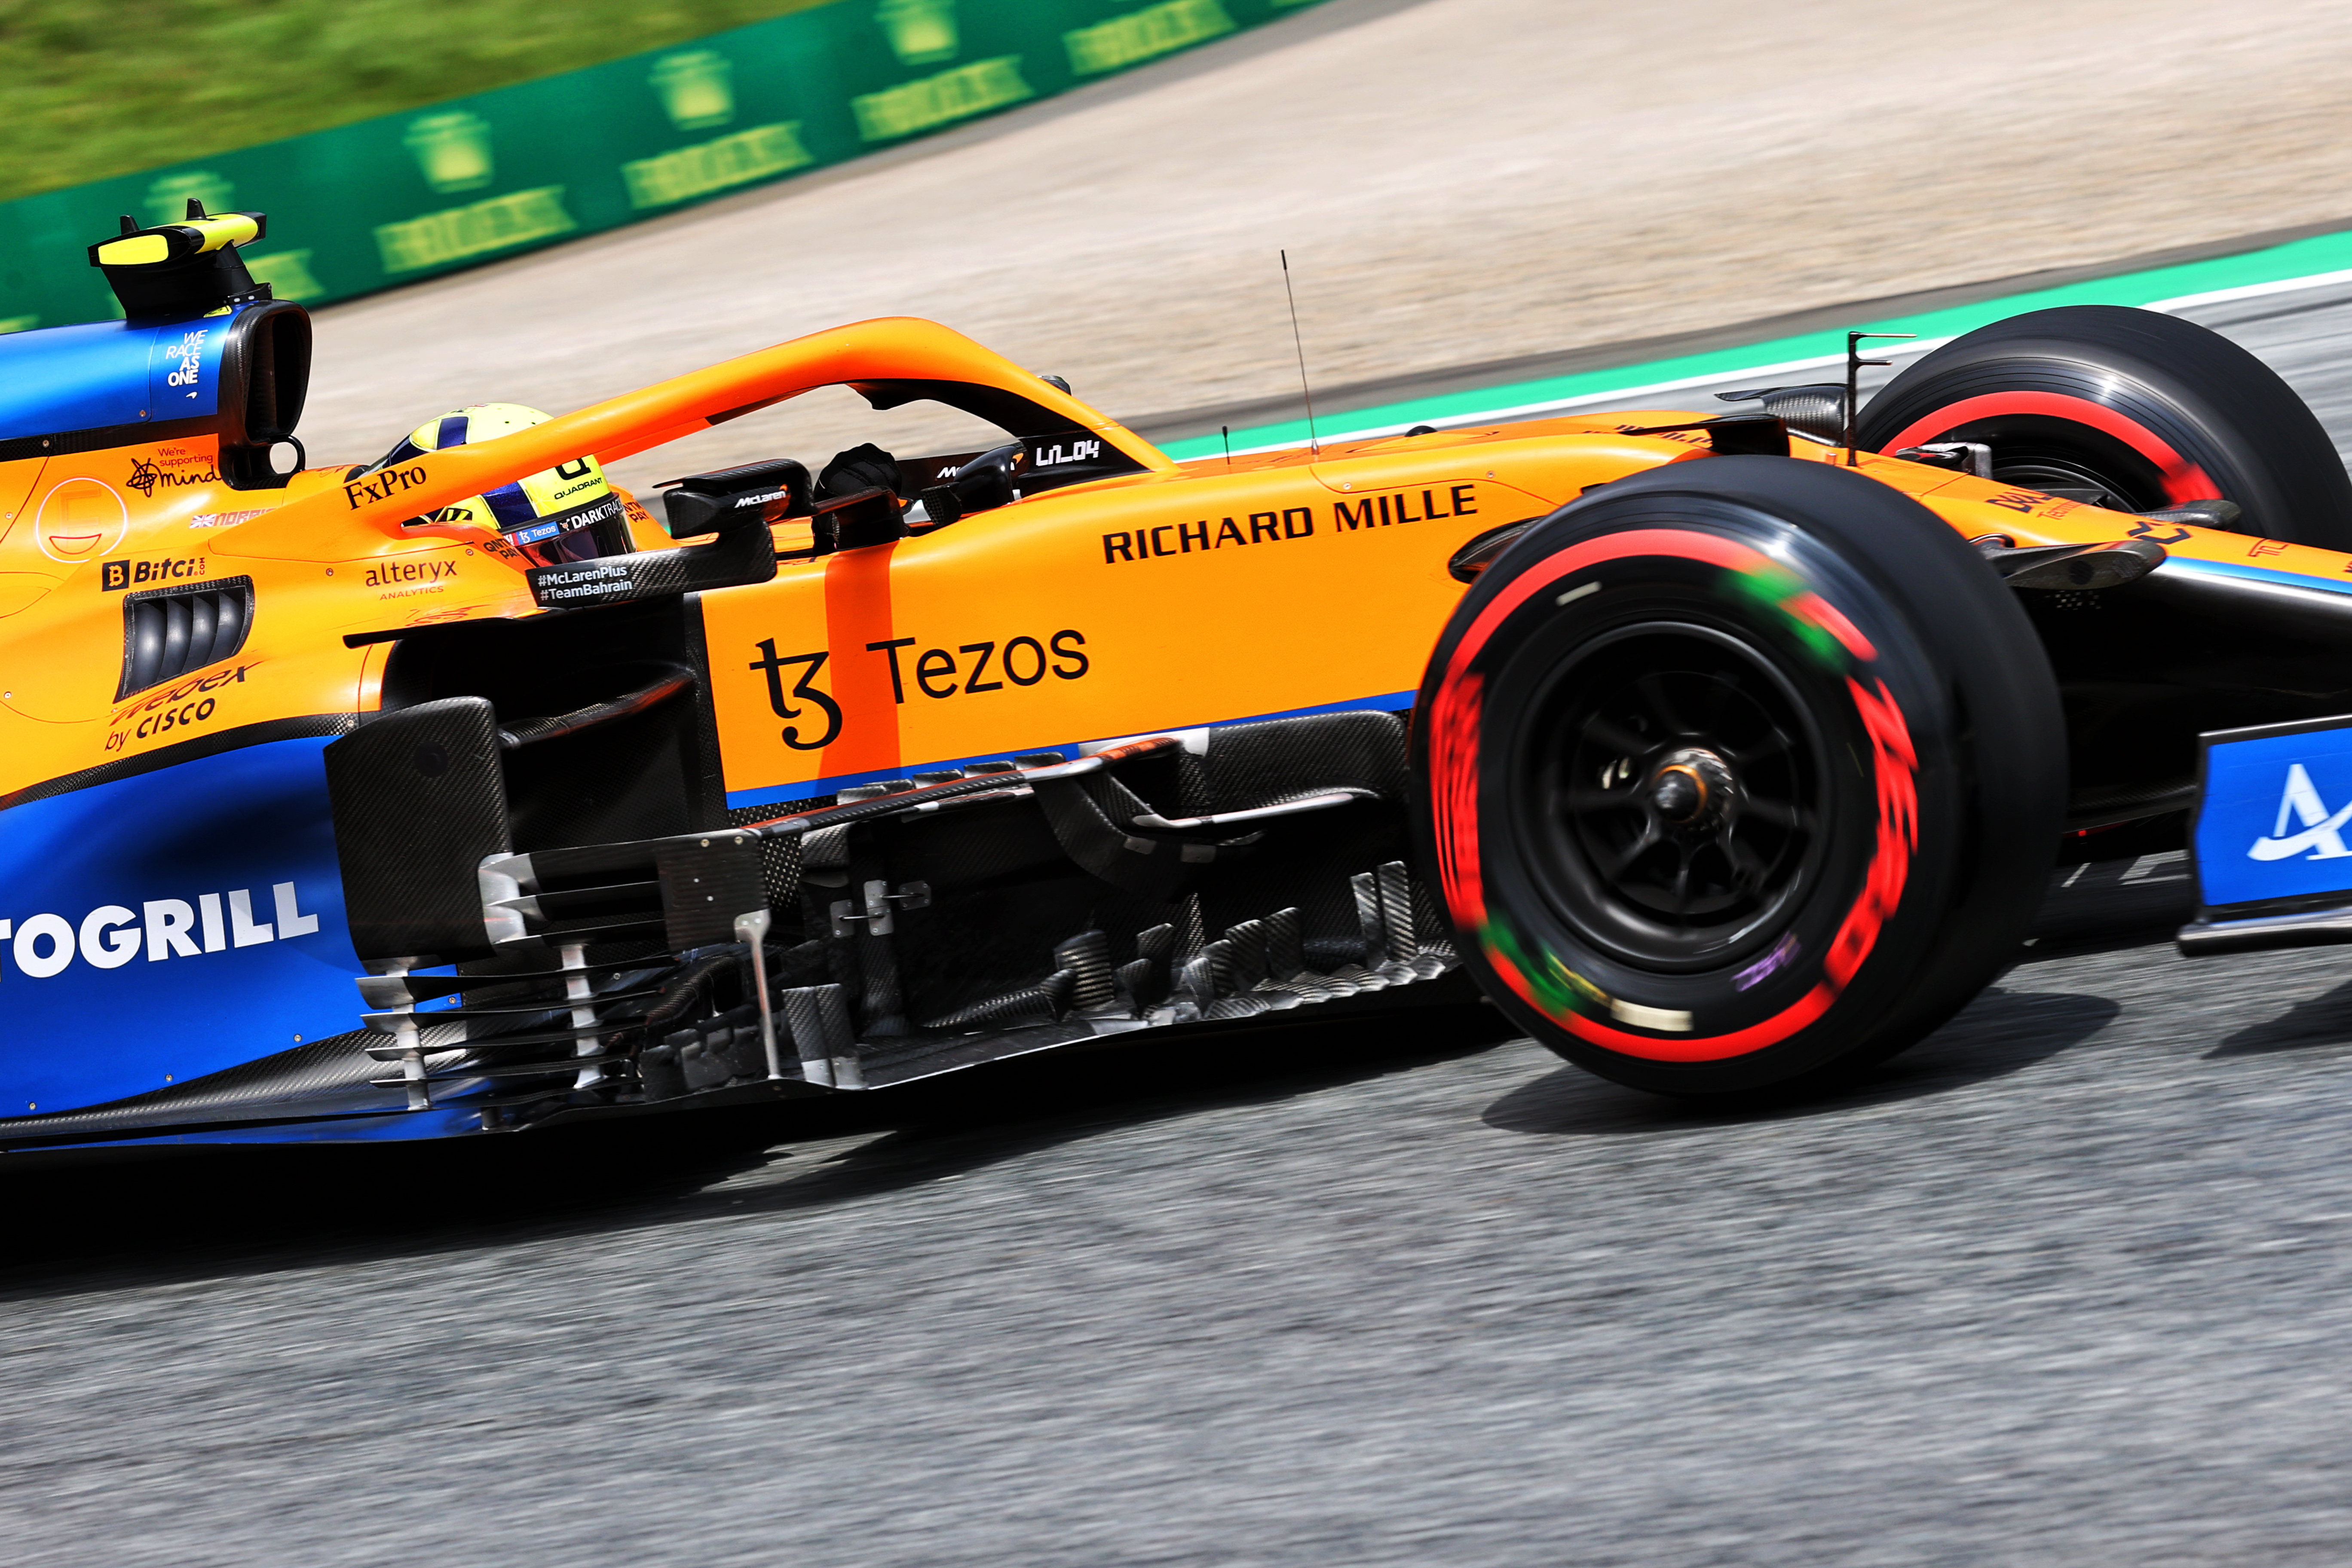 Motor Racing Formula One World Championship Steiermark Grand Prix Practice Day Spielberg, Austria